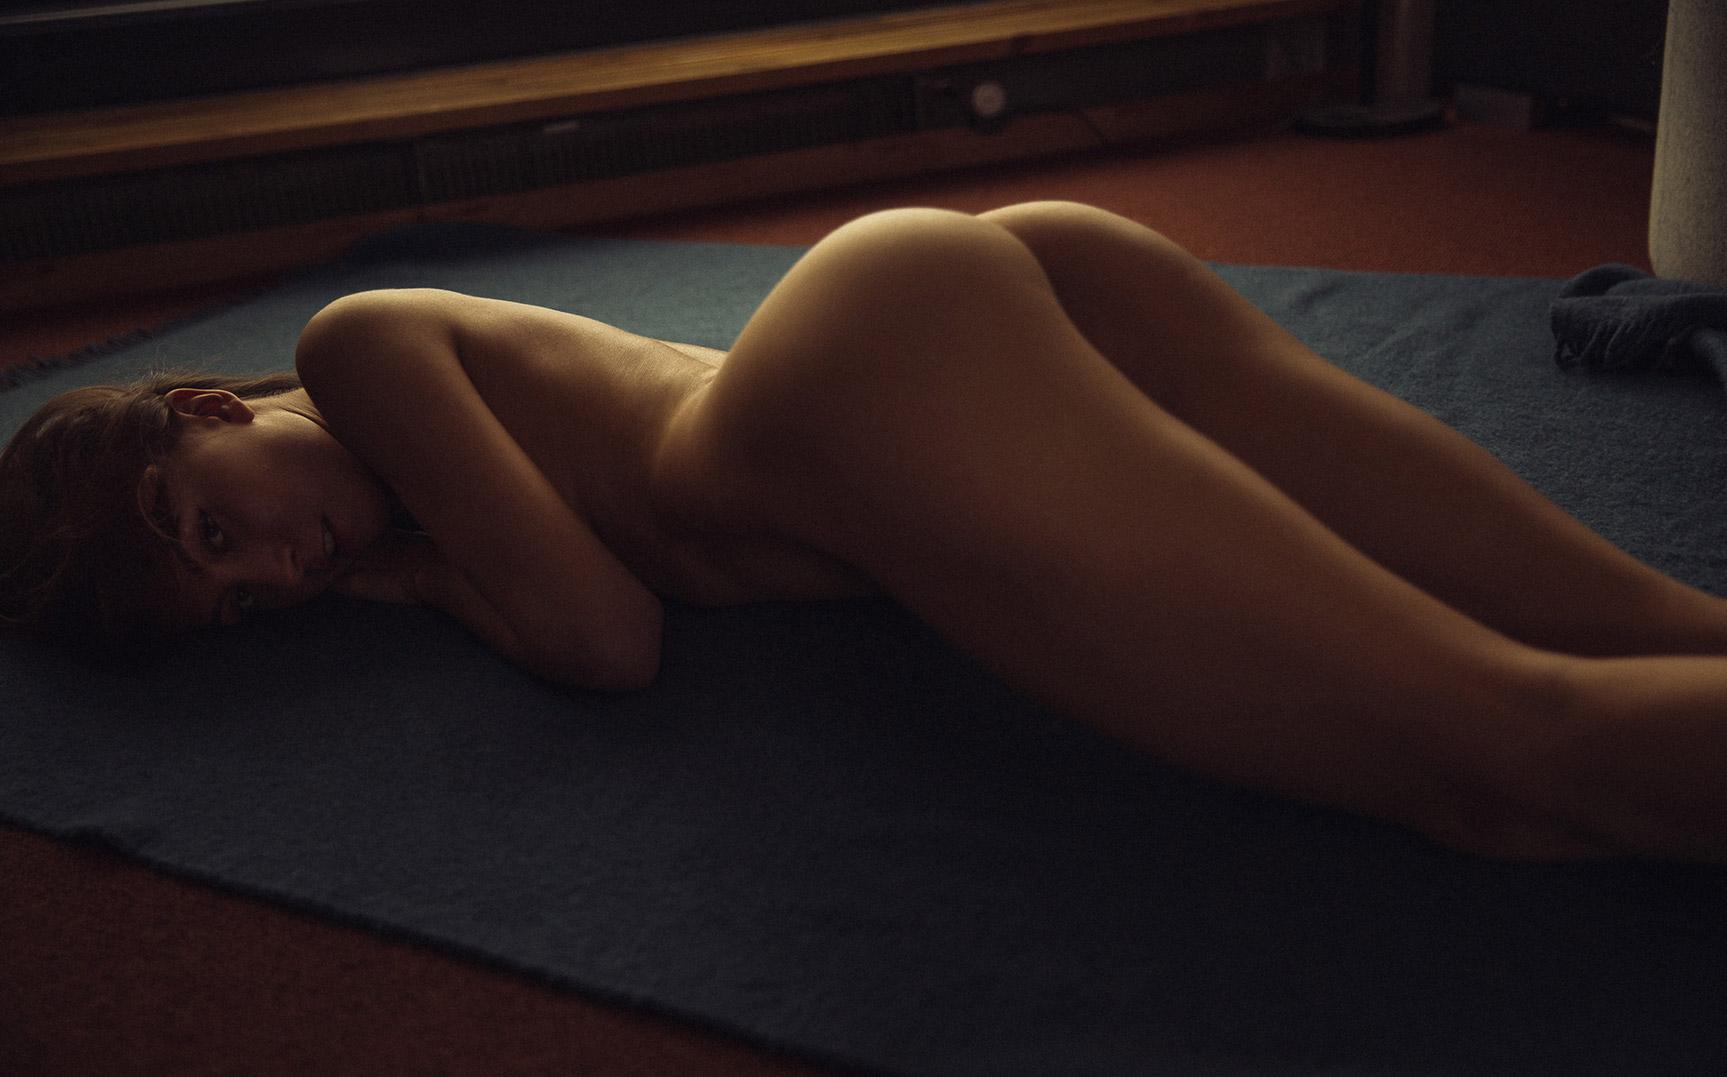 обнаженная Анна Орлова / Anna Orlova nude by Thomas Agatz